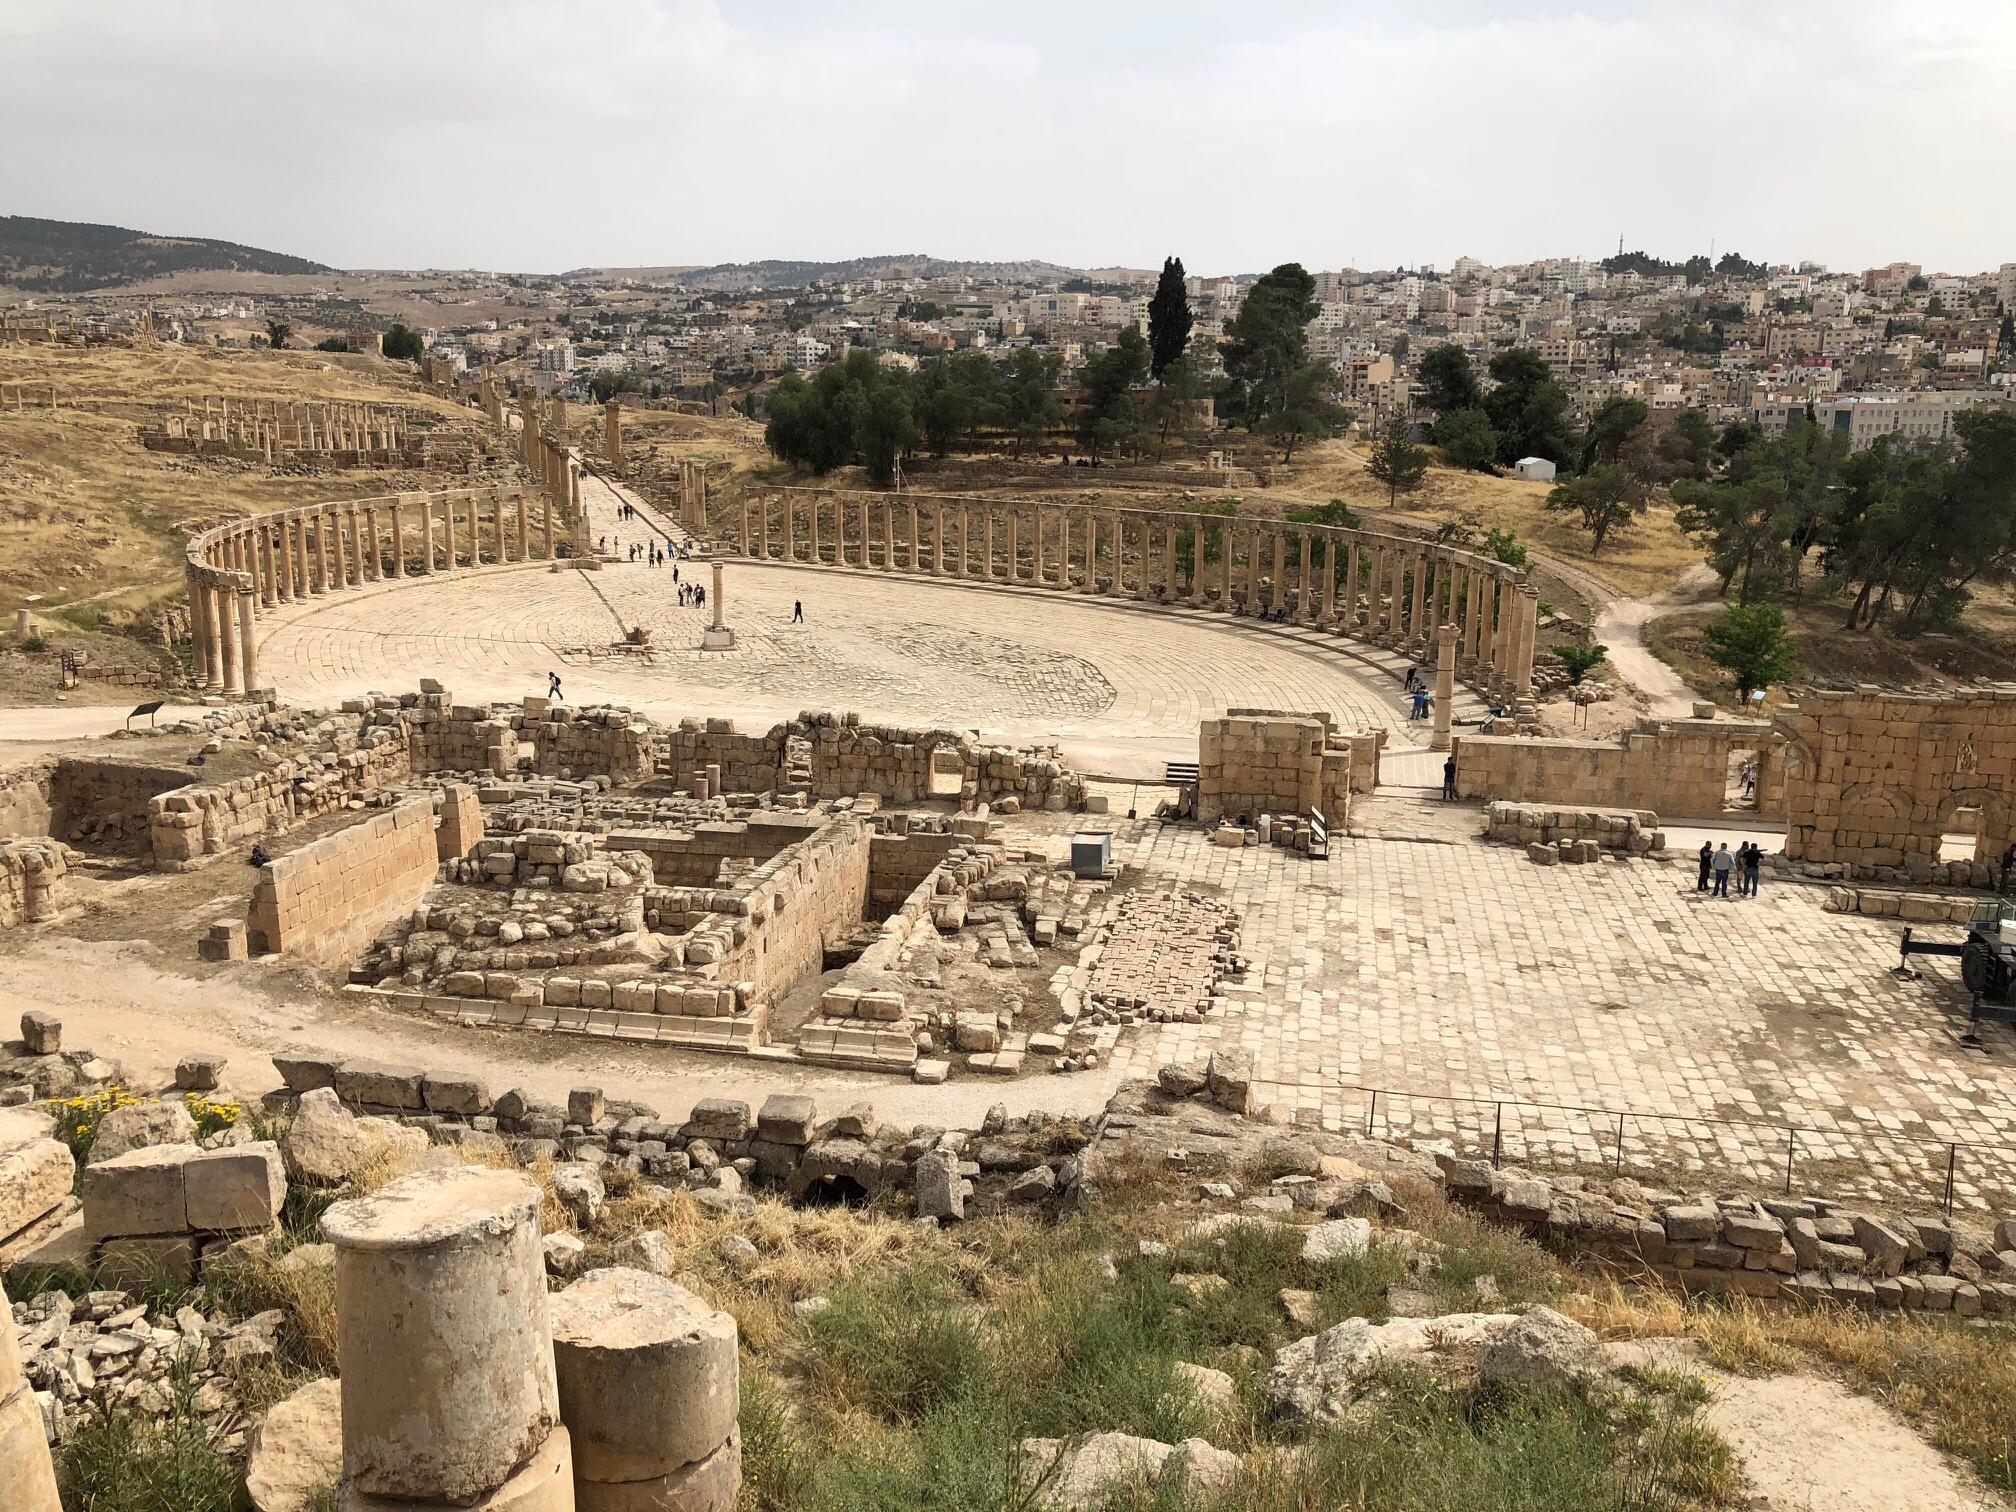 Roman ruins at Jerash, Jordan